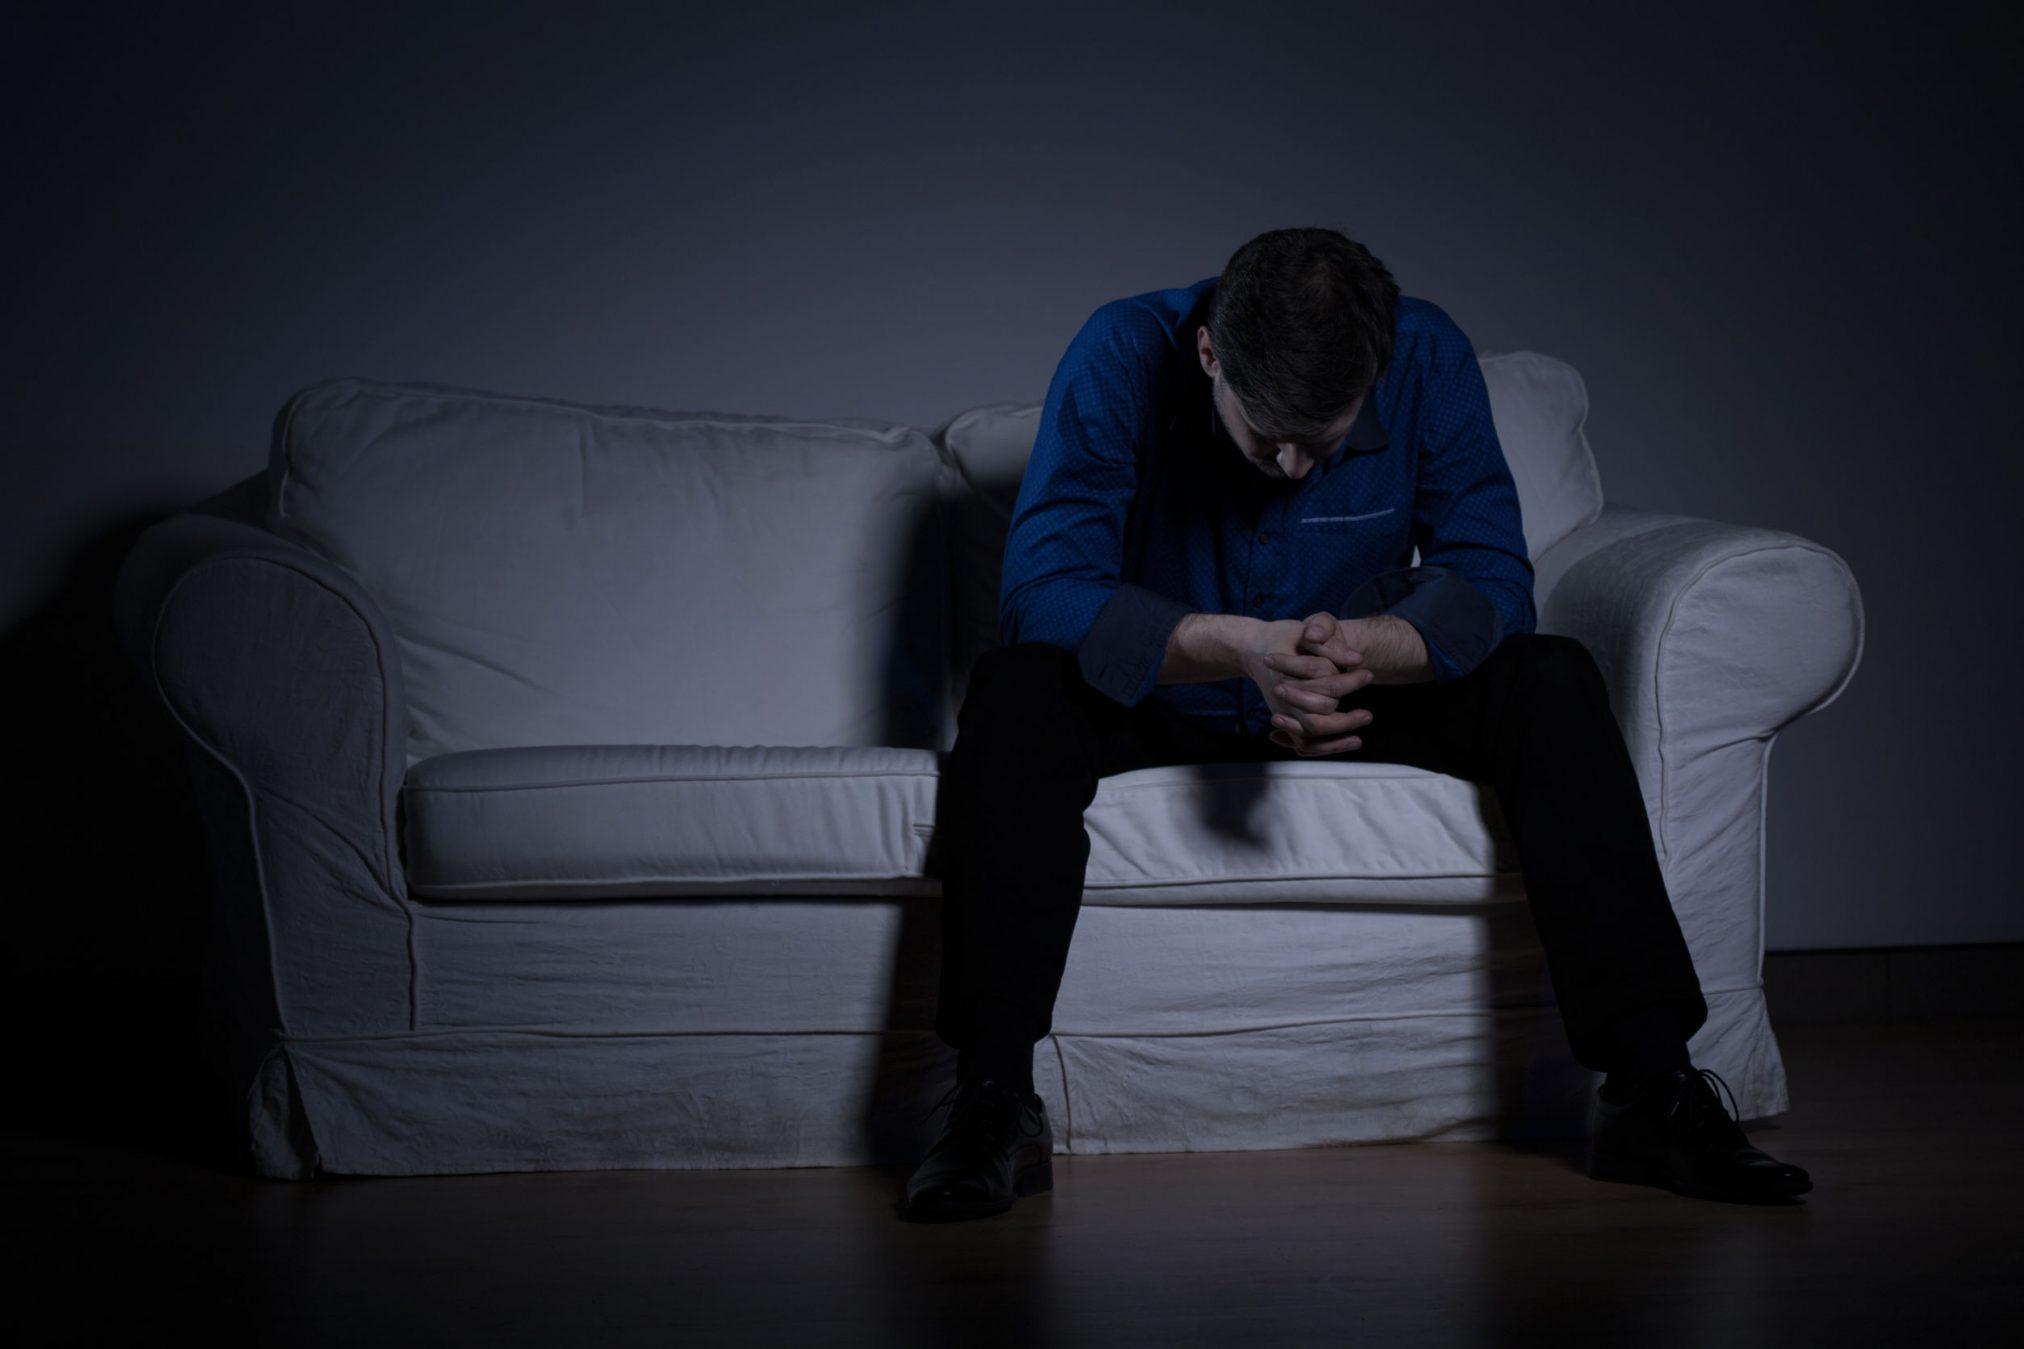 sad man on couch in dark